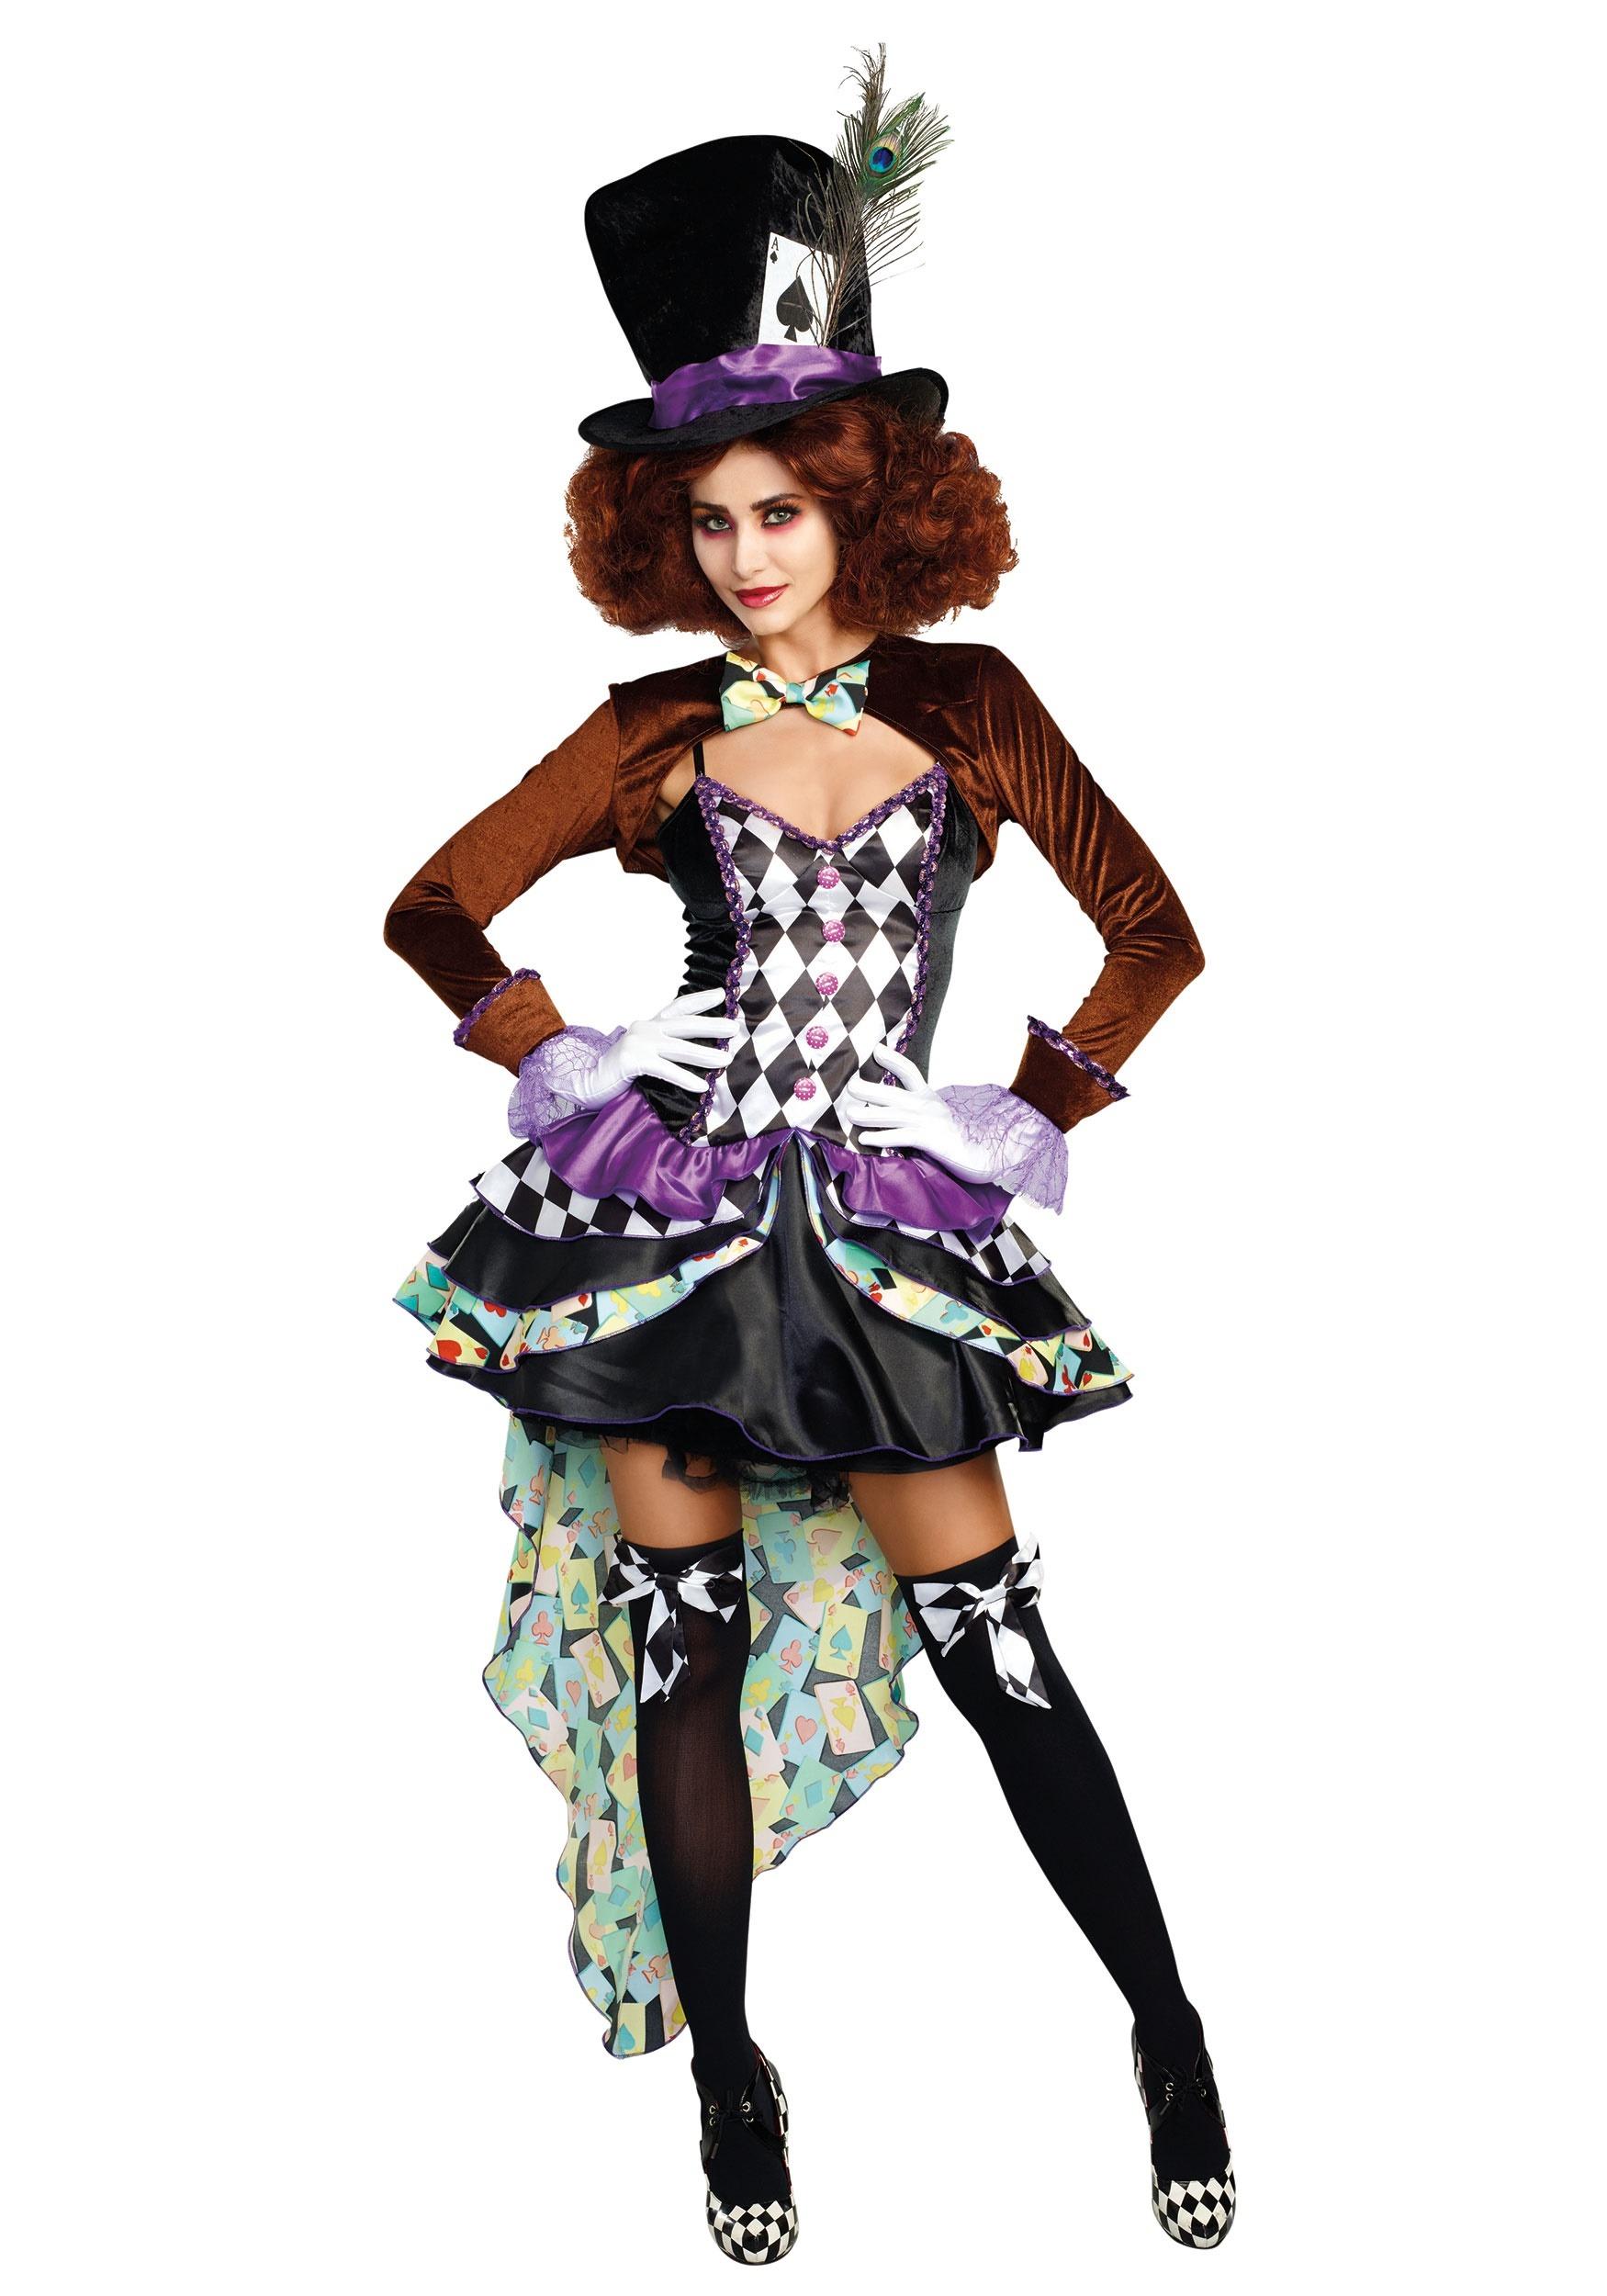 Raving Mad Hatter Costume for Women